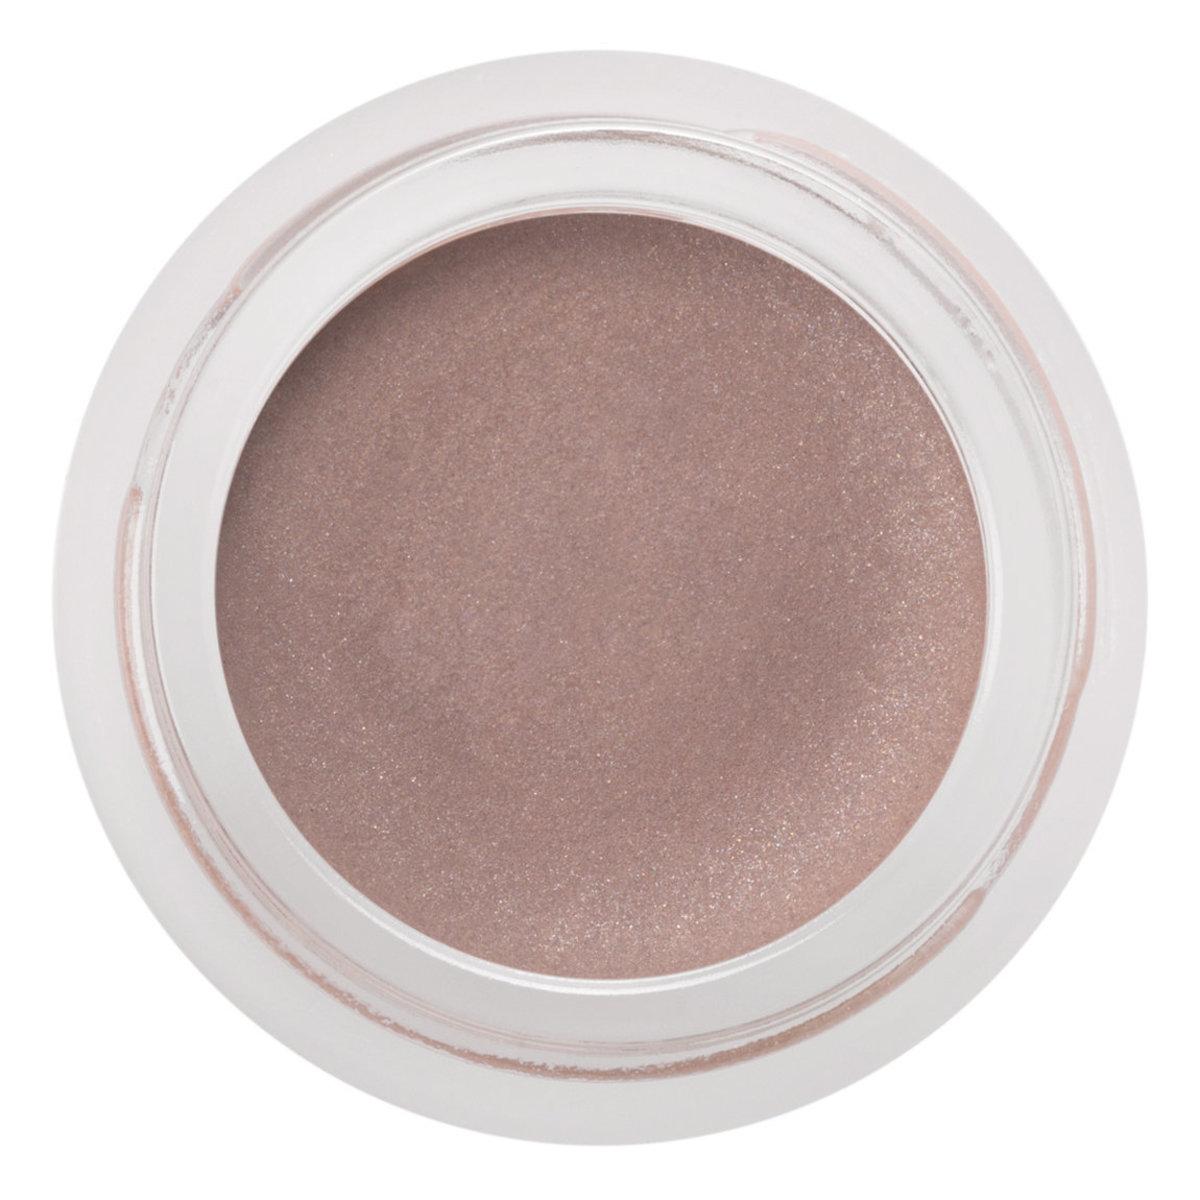 RMS Beauty Cream Eye Polish in Myth